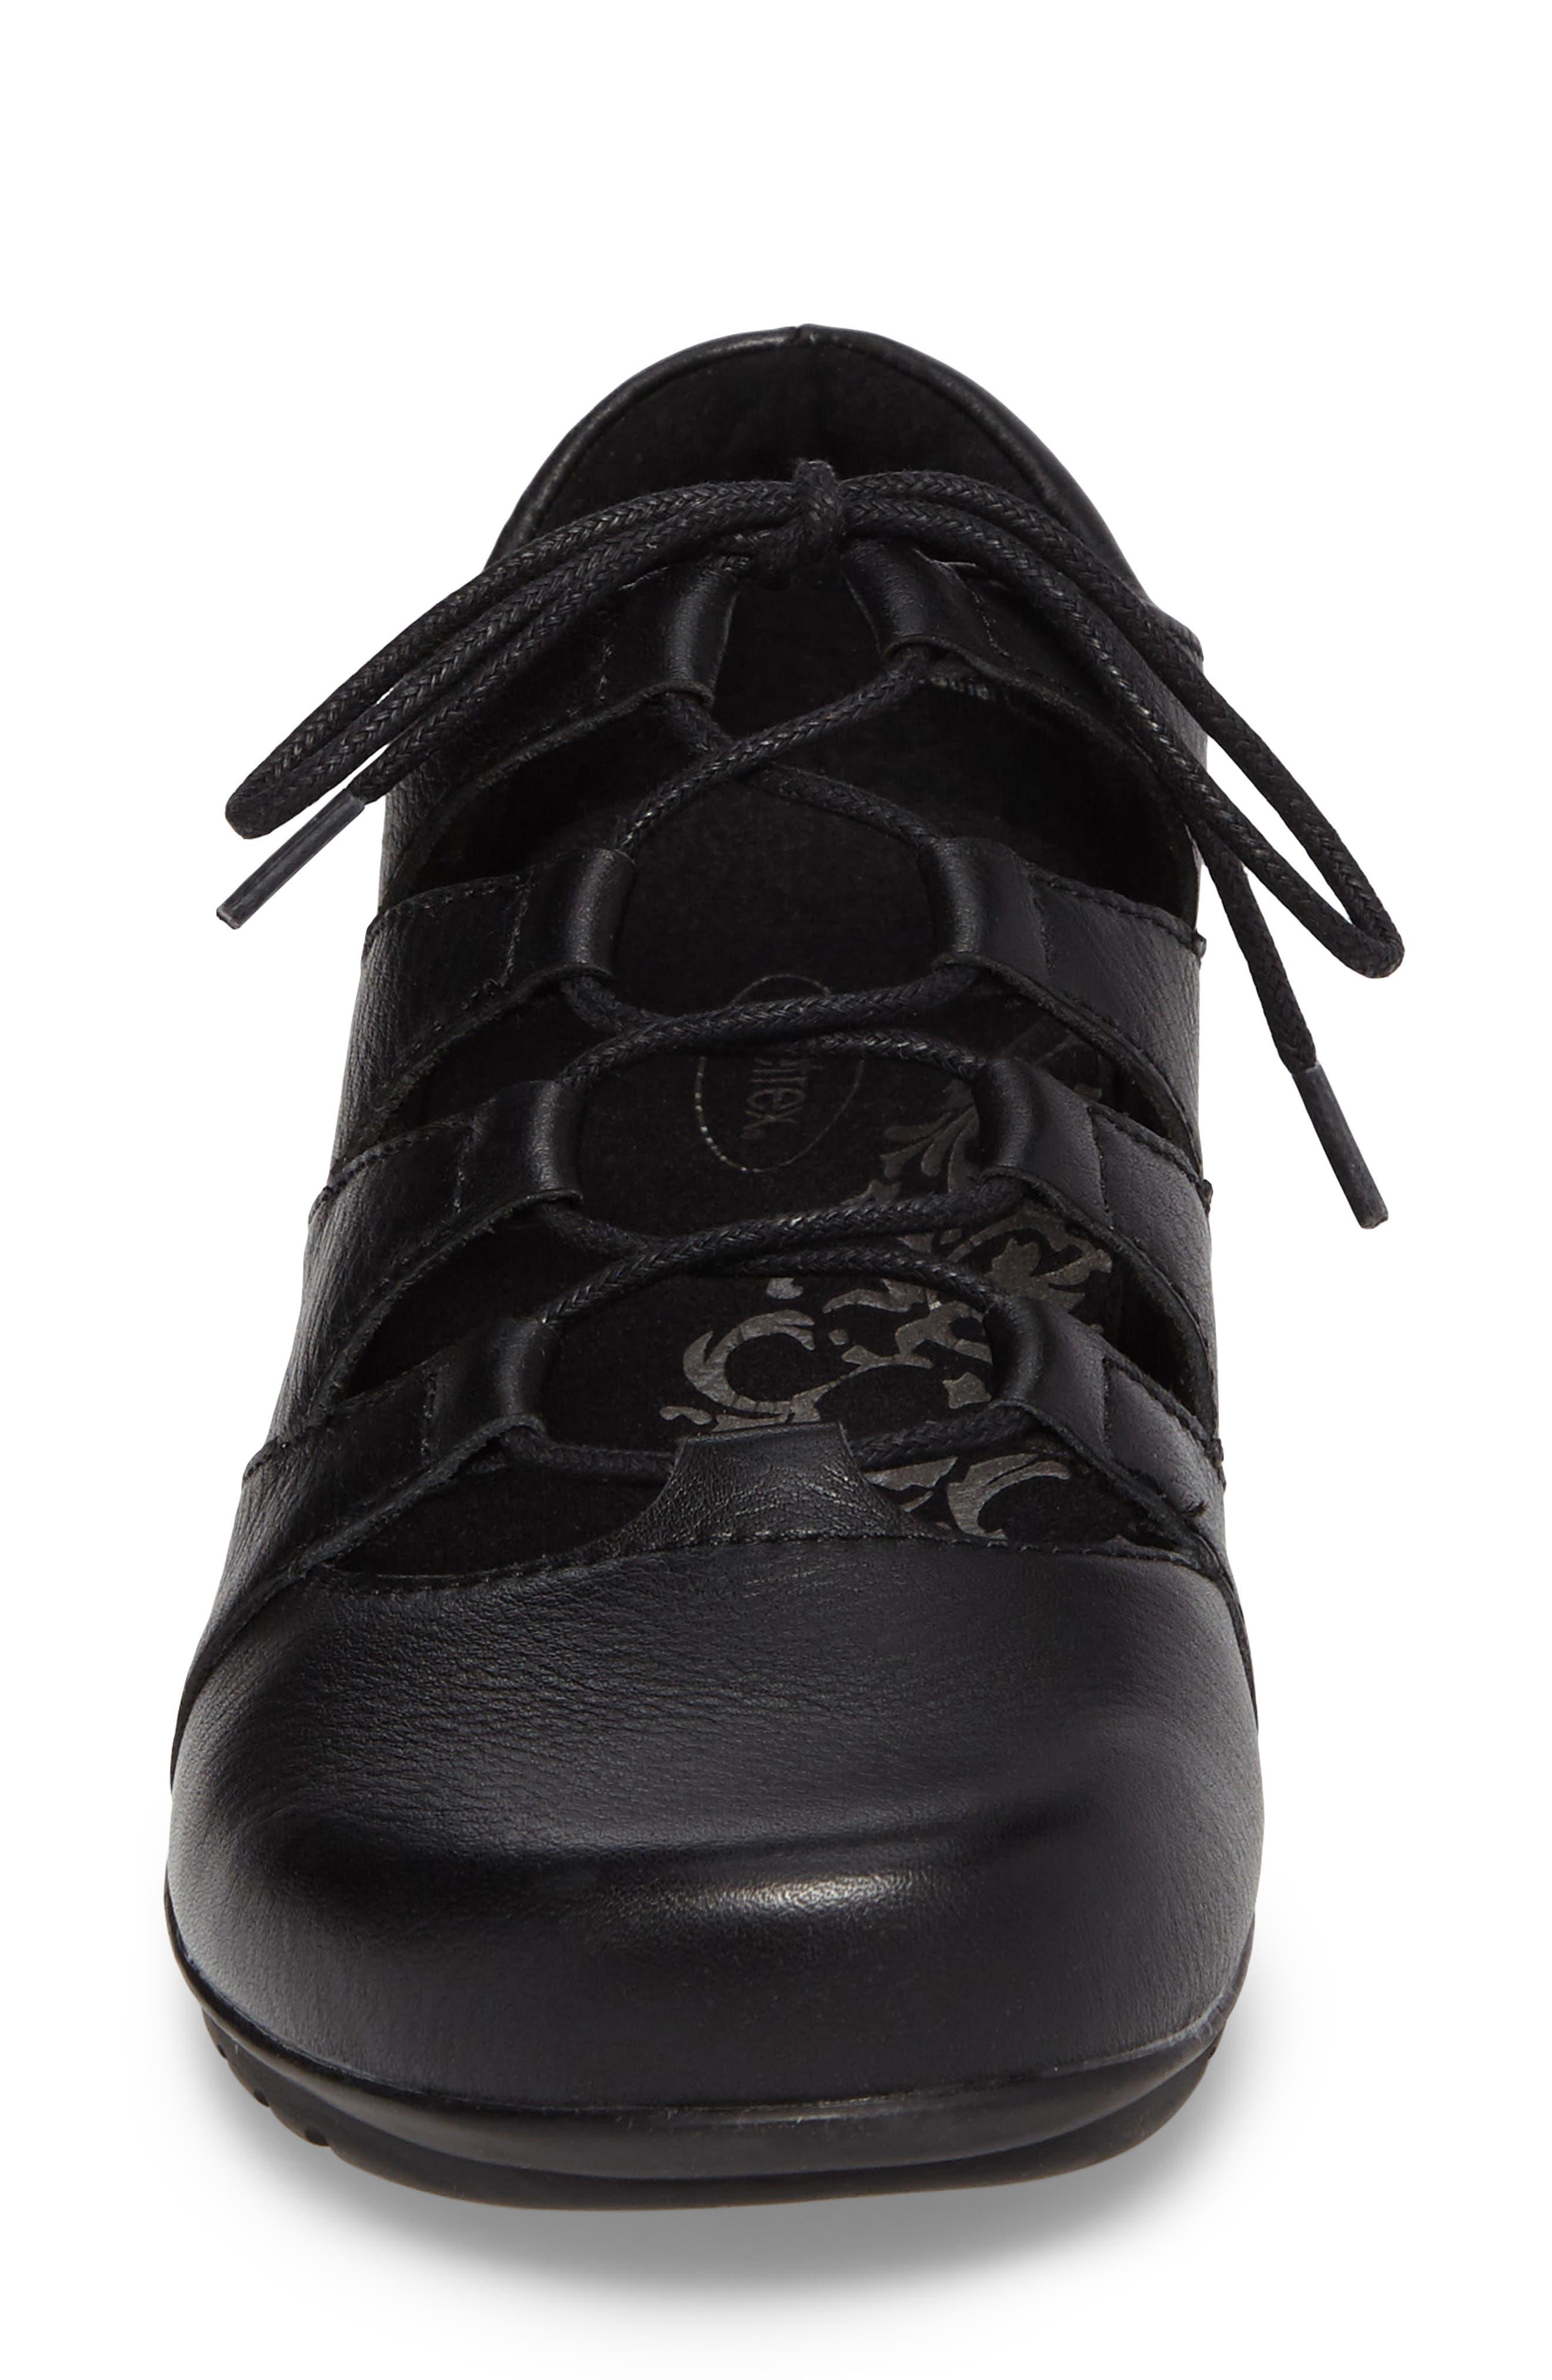 Sienna Cutout Sneaker,                             Alternate thumbnail 4, color,                             BLACK LEATHER/ BLACK